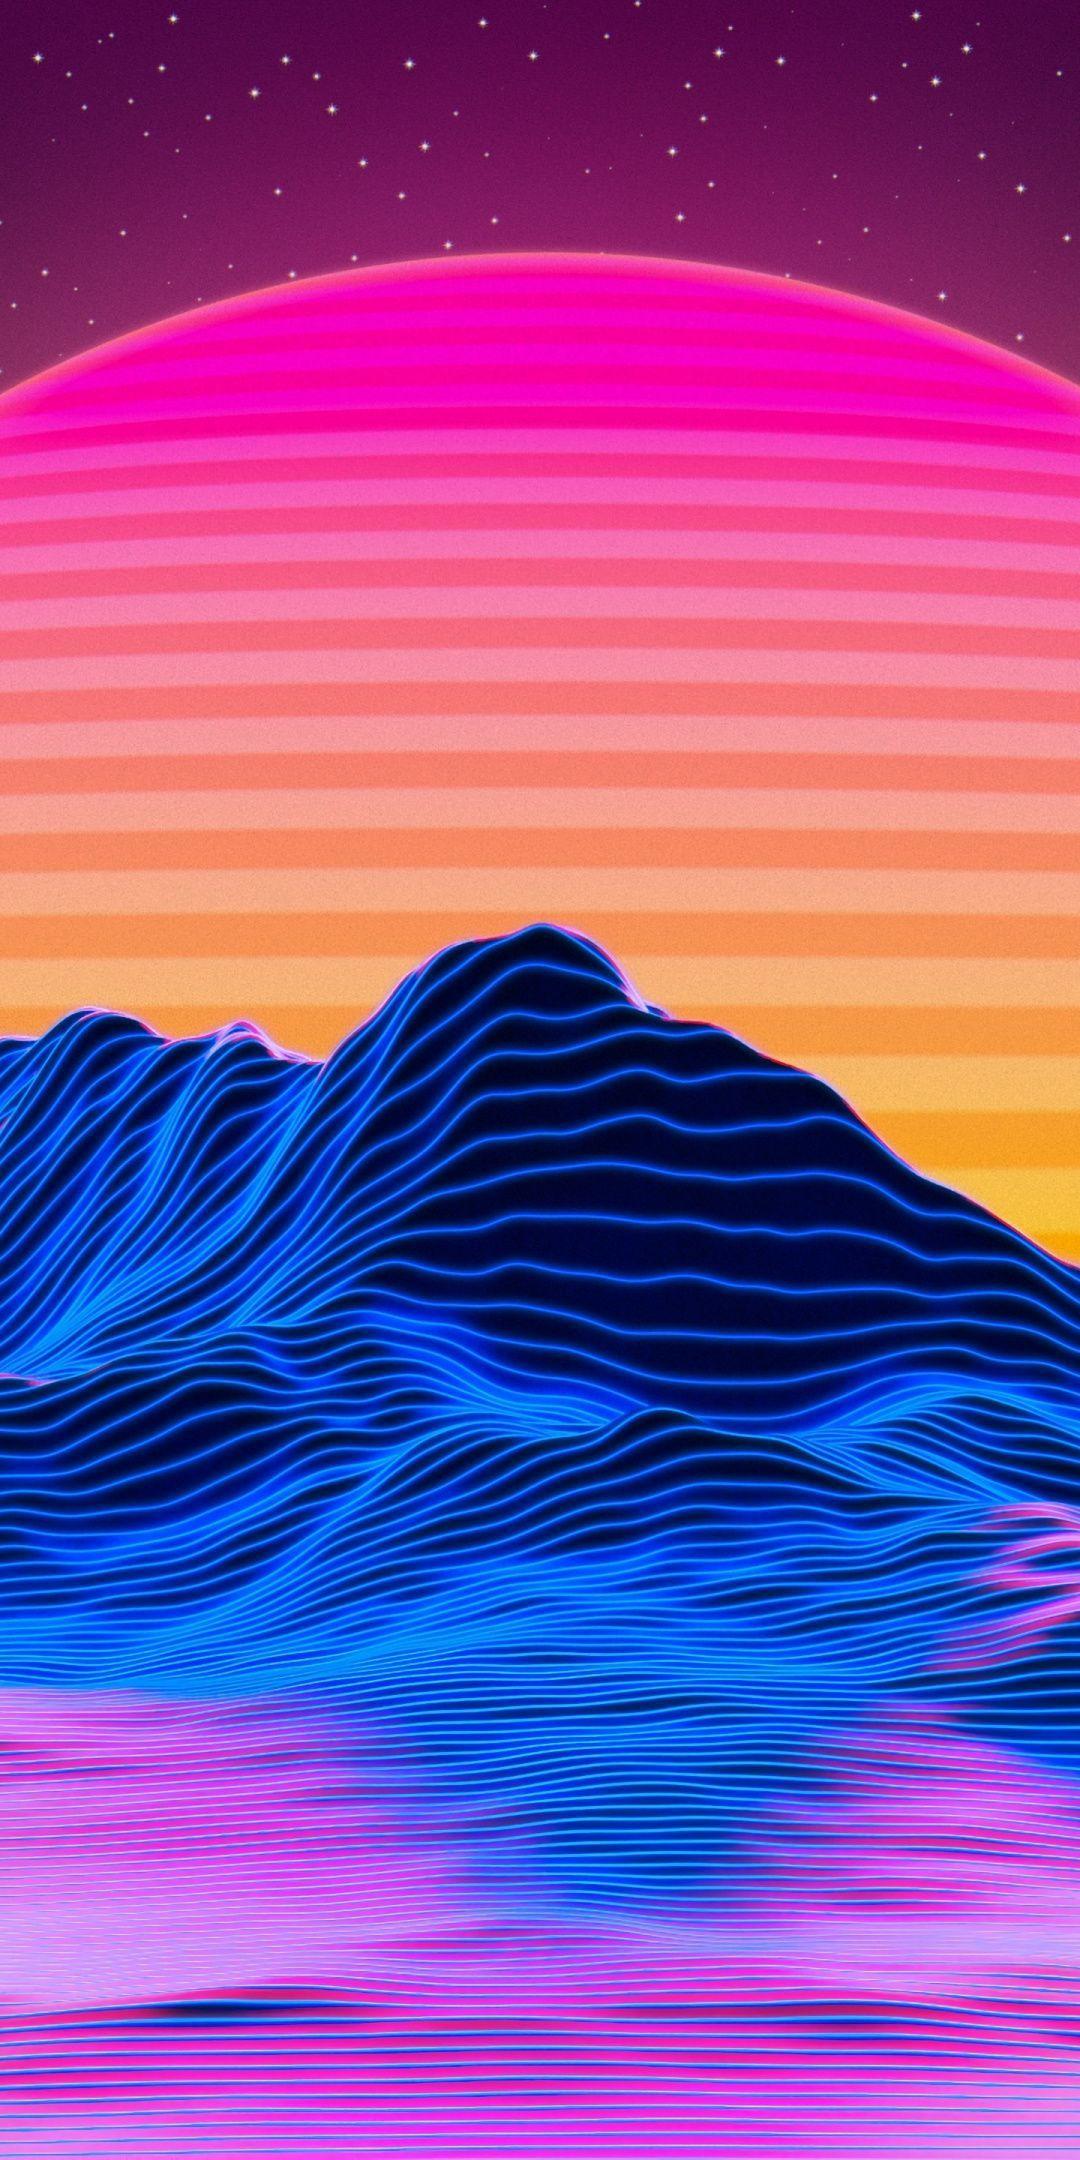 1080x2160 Mountains, landscape, retro art, big sun, sunset